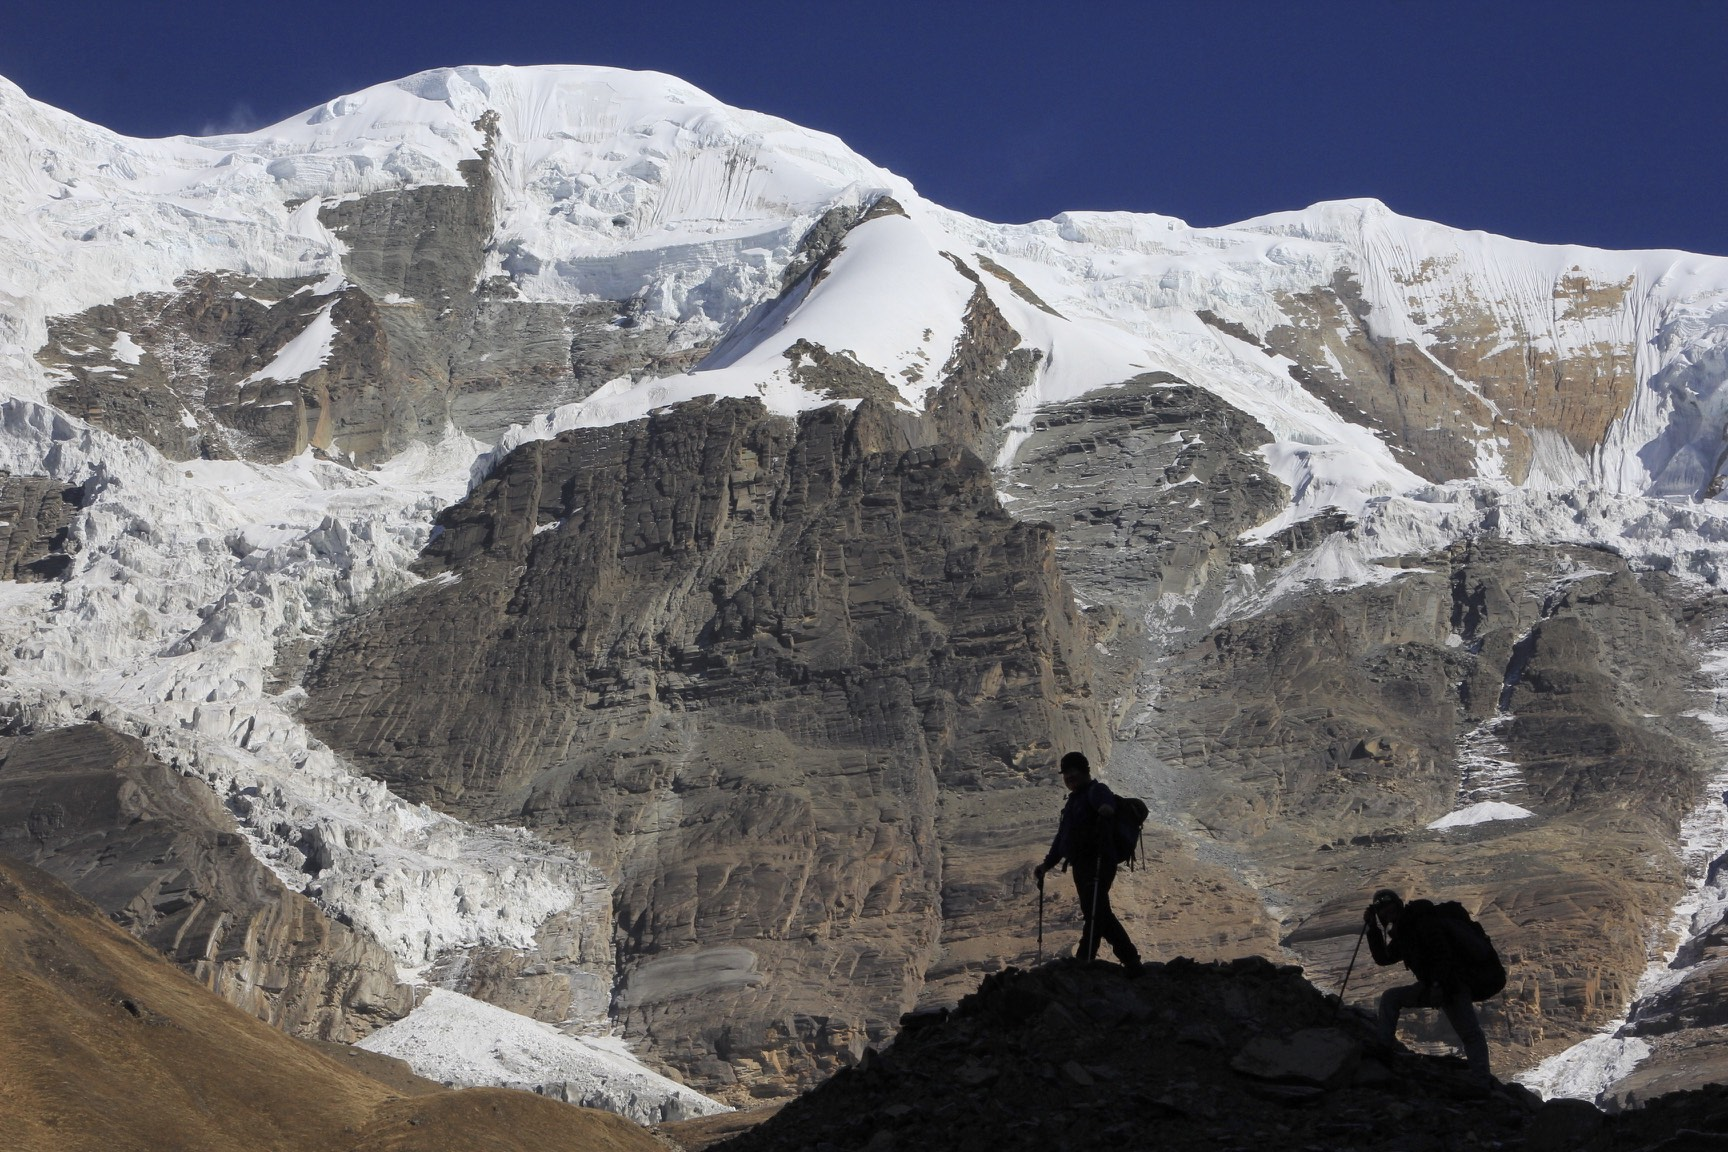 Nort-west ridge of Dhaulagiri II.